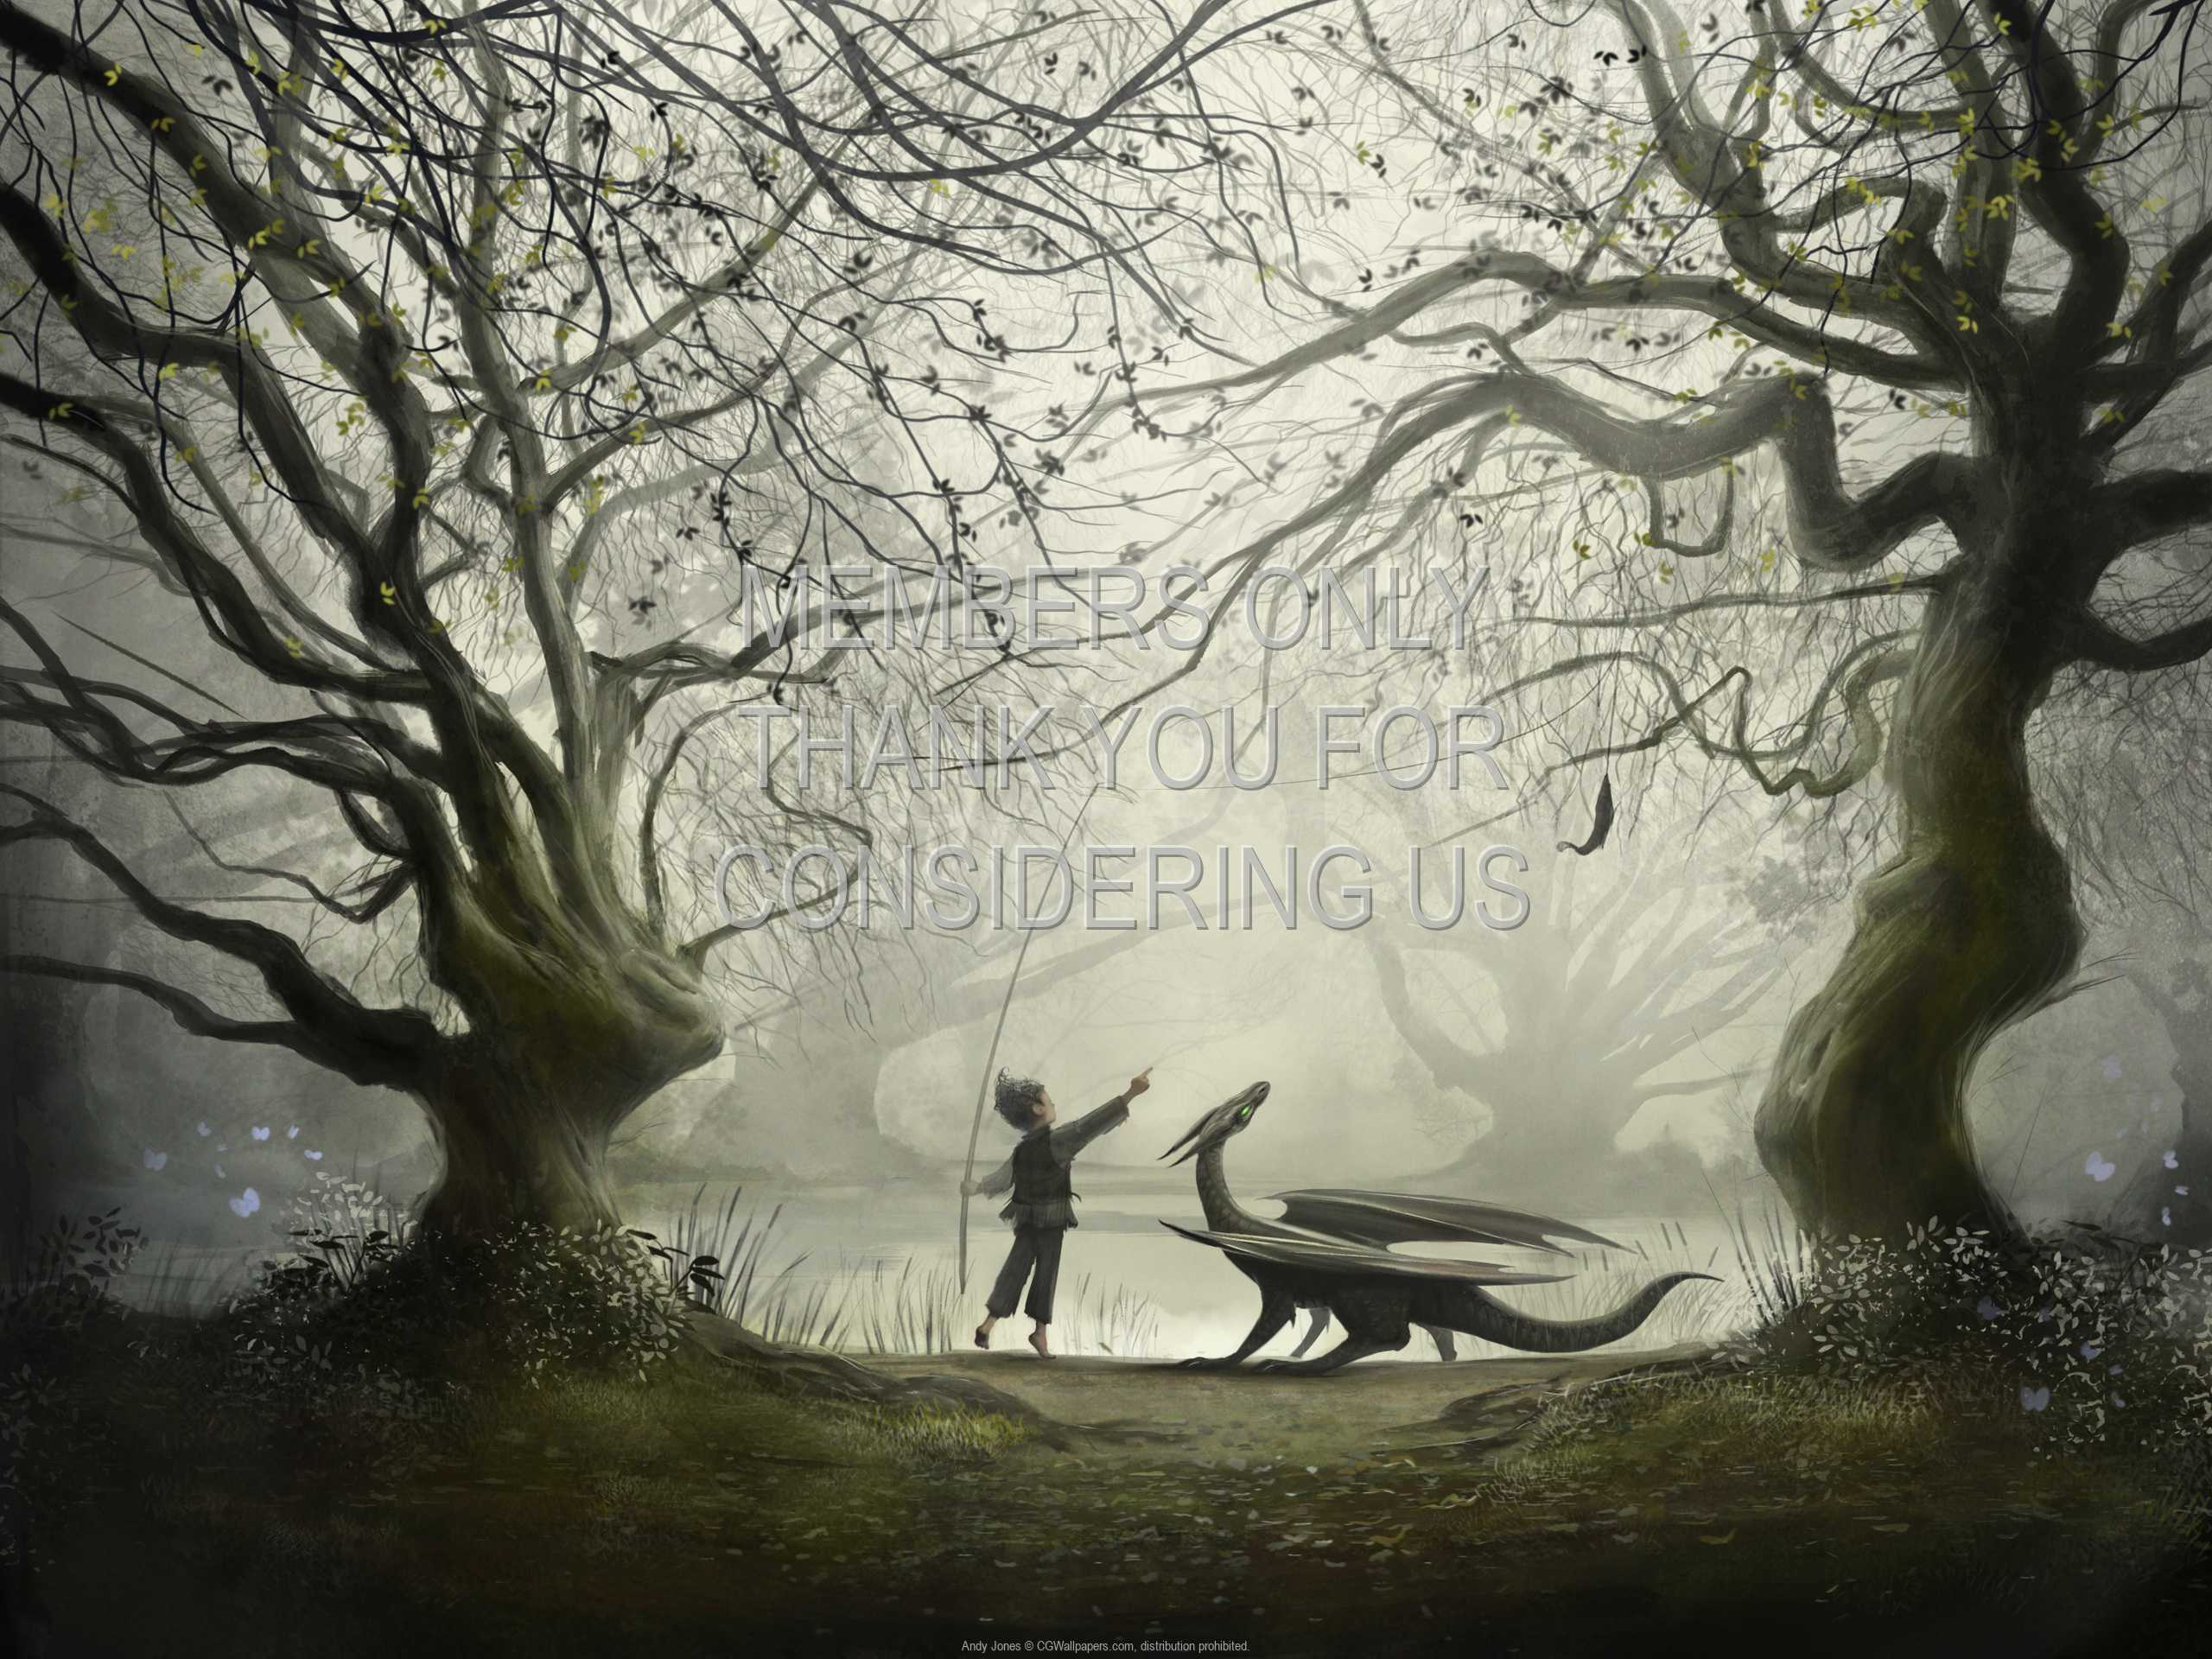 Andy Jones 1080p Horizontal Mobile wallpaper or background 10